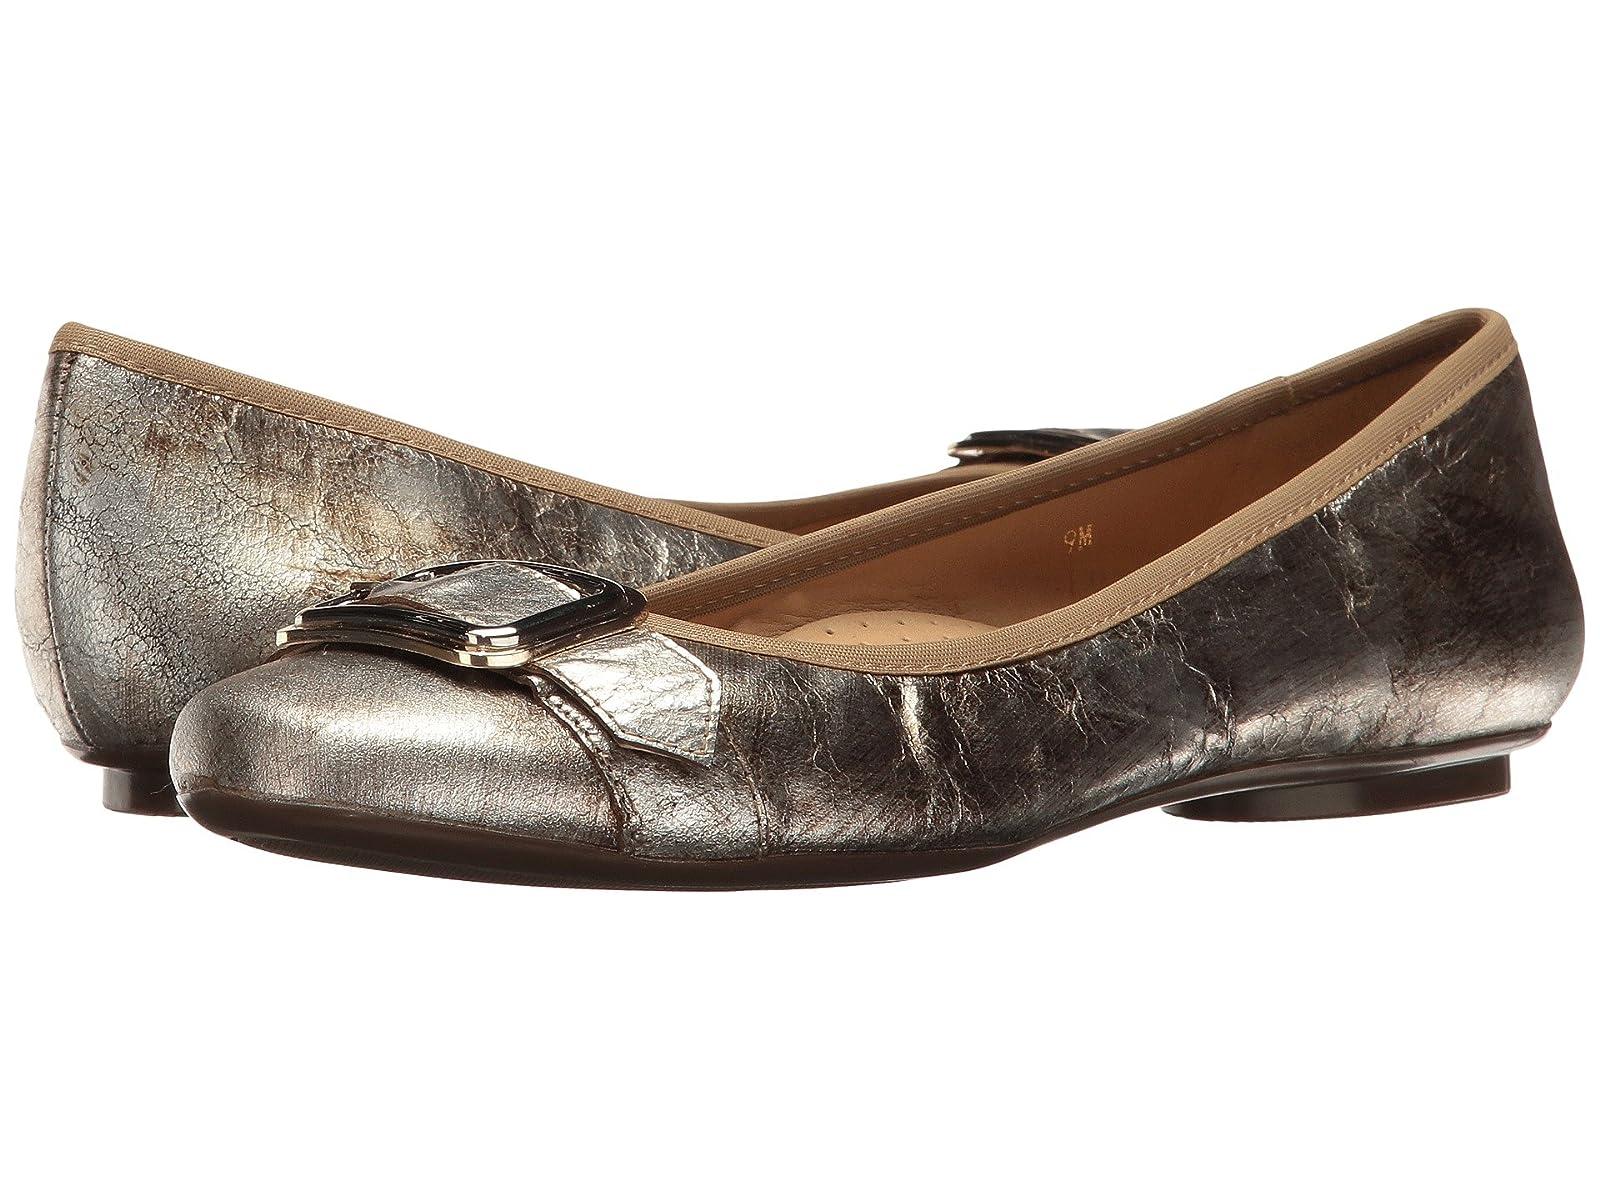 Vaneli SolanaCheap and distinctive eye-catching shoes